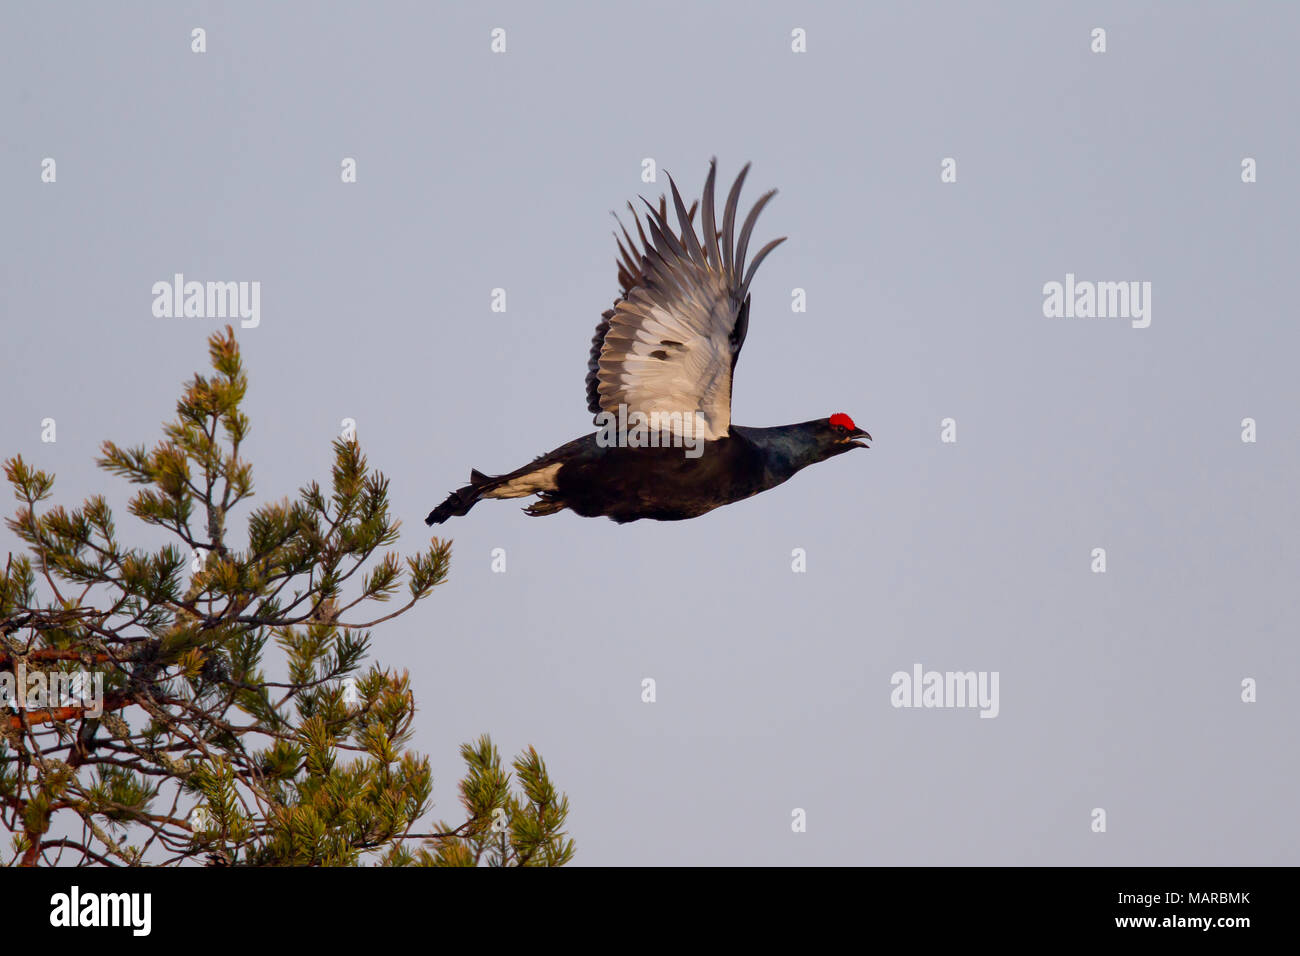 Black Grouse (Tetrao tetrix, Lyrurus tetrix). Male (blackcock) flying off from a treetop. Sweden - Stock Image